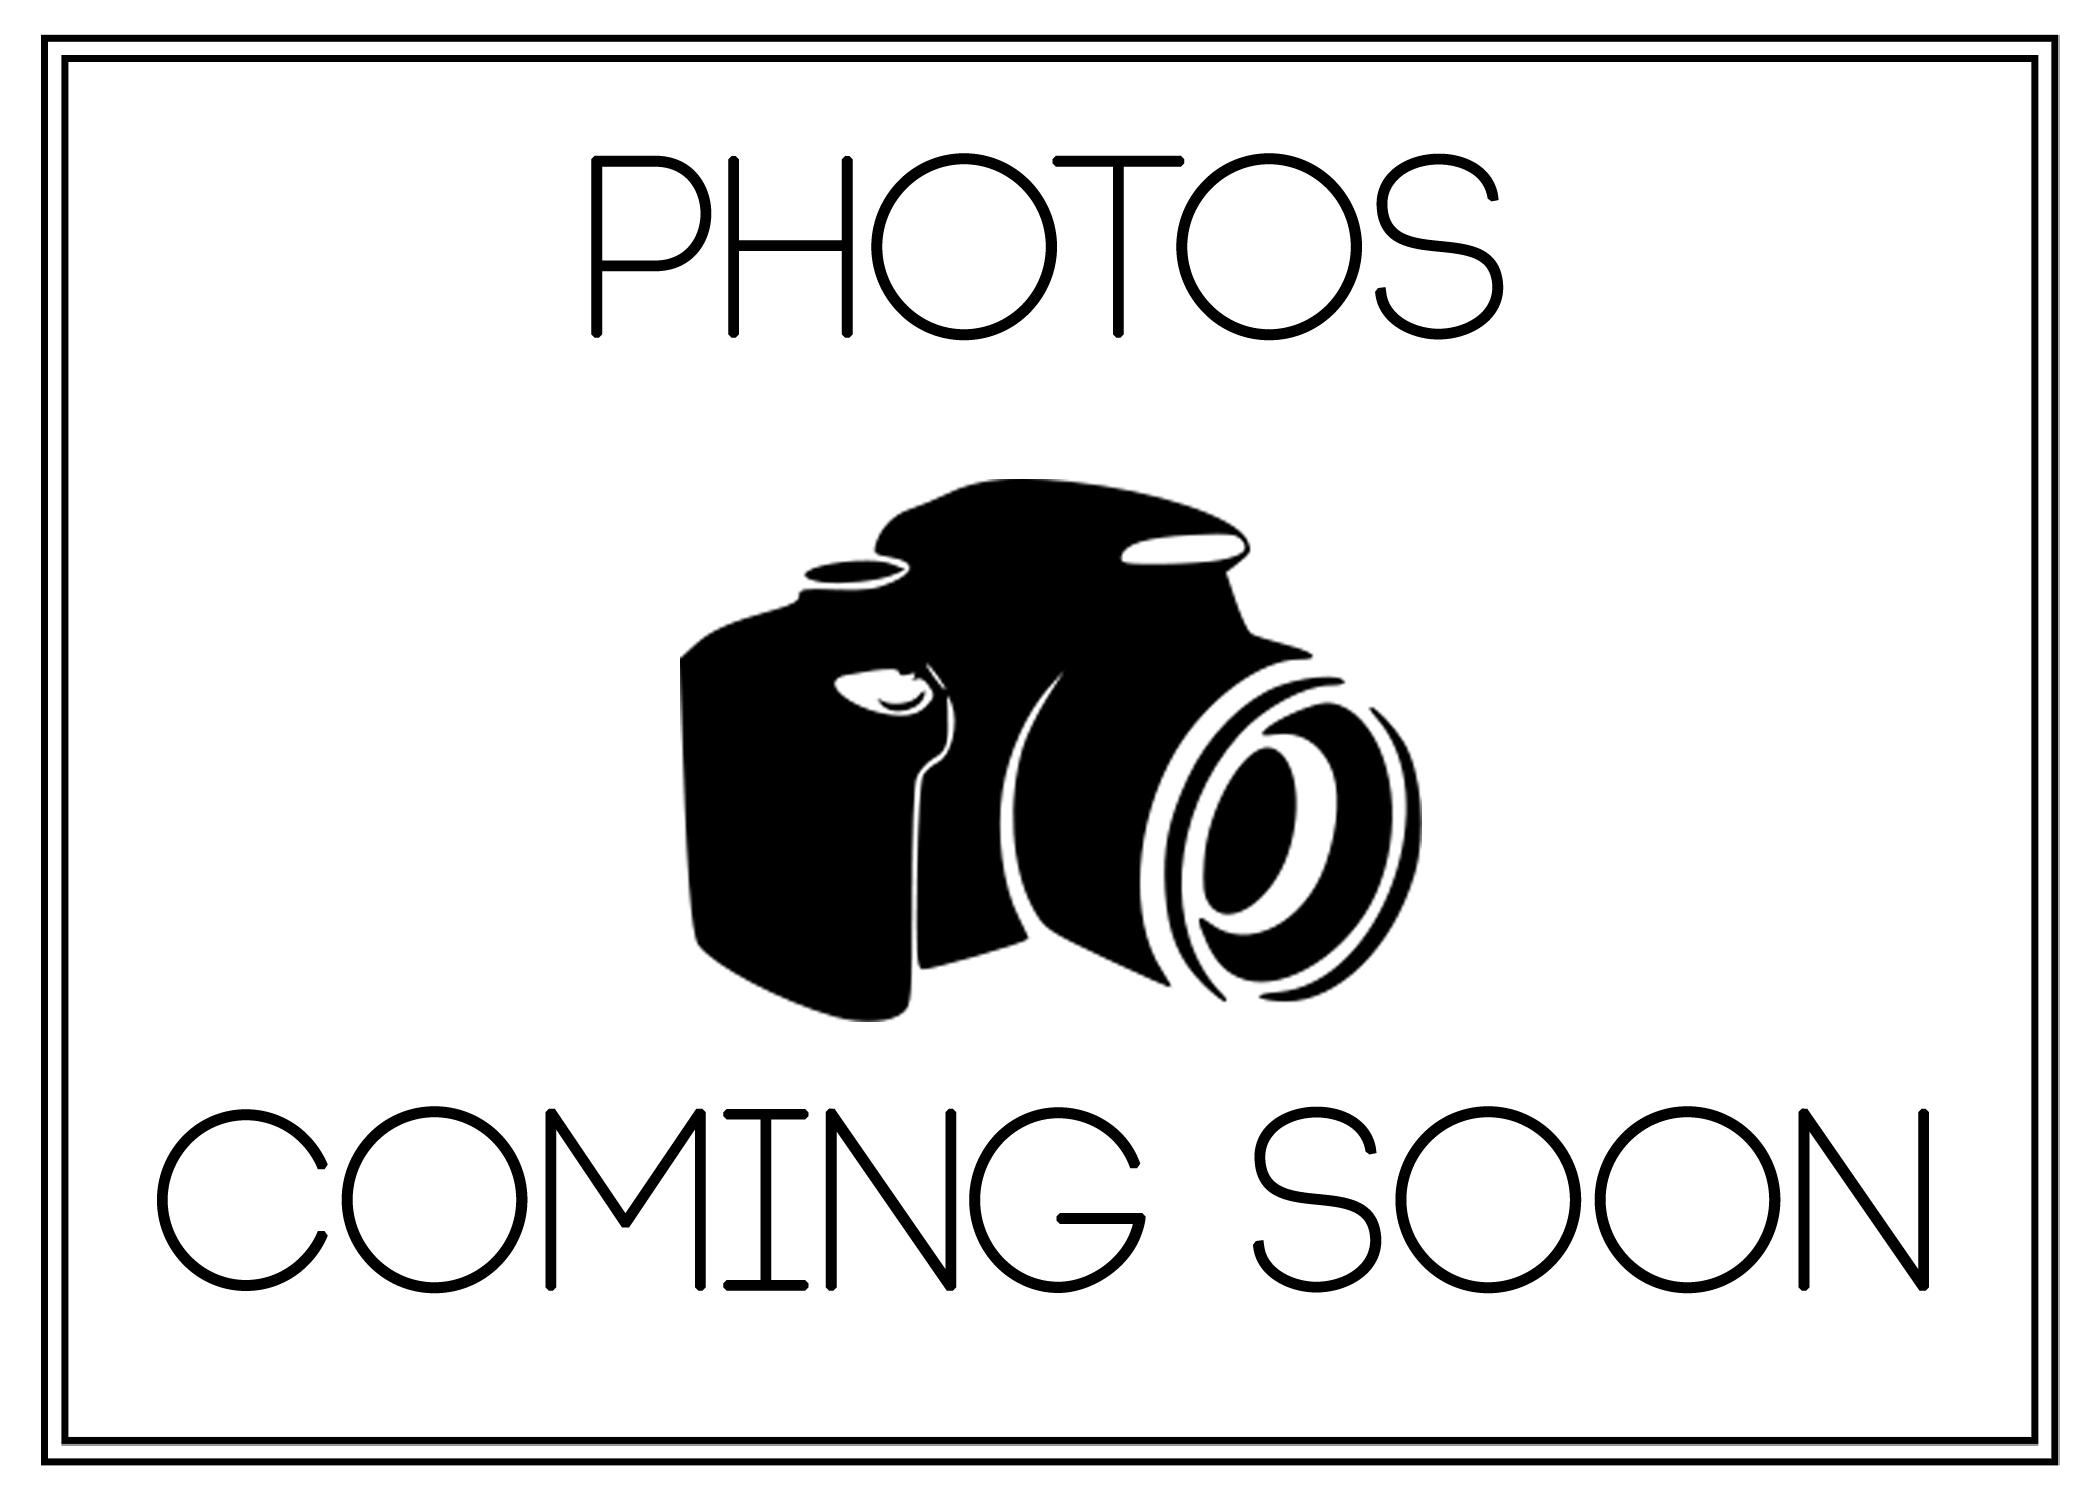 Photos-Coming-Soon.jpg